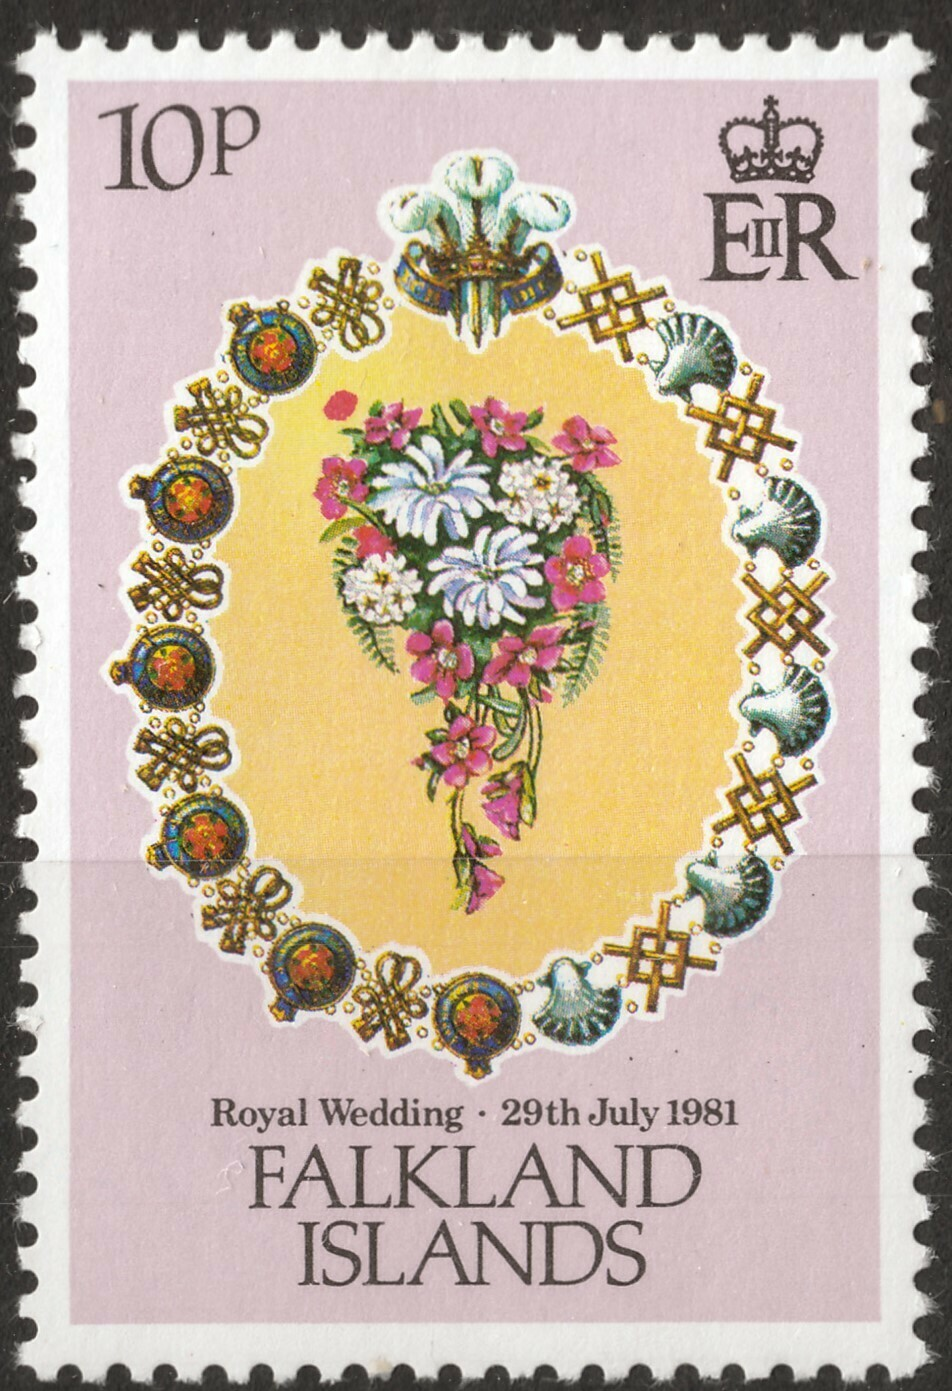 Falkland Islands 1981 QEII 10p Royal Wedding with Extra Flower Variety MUH